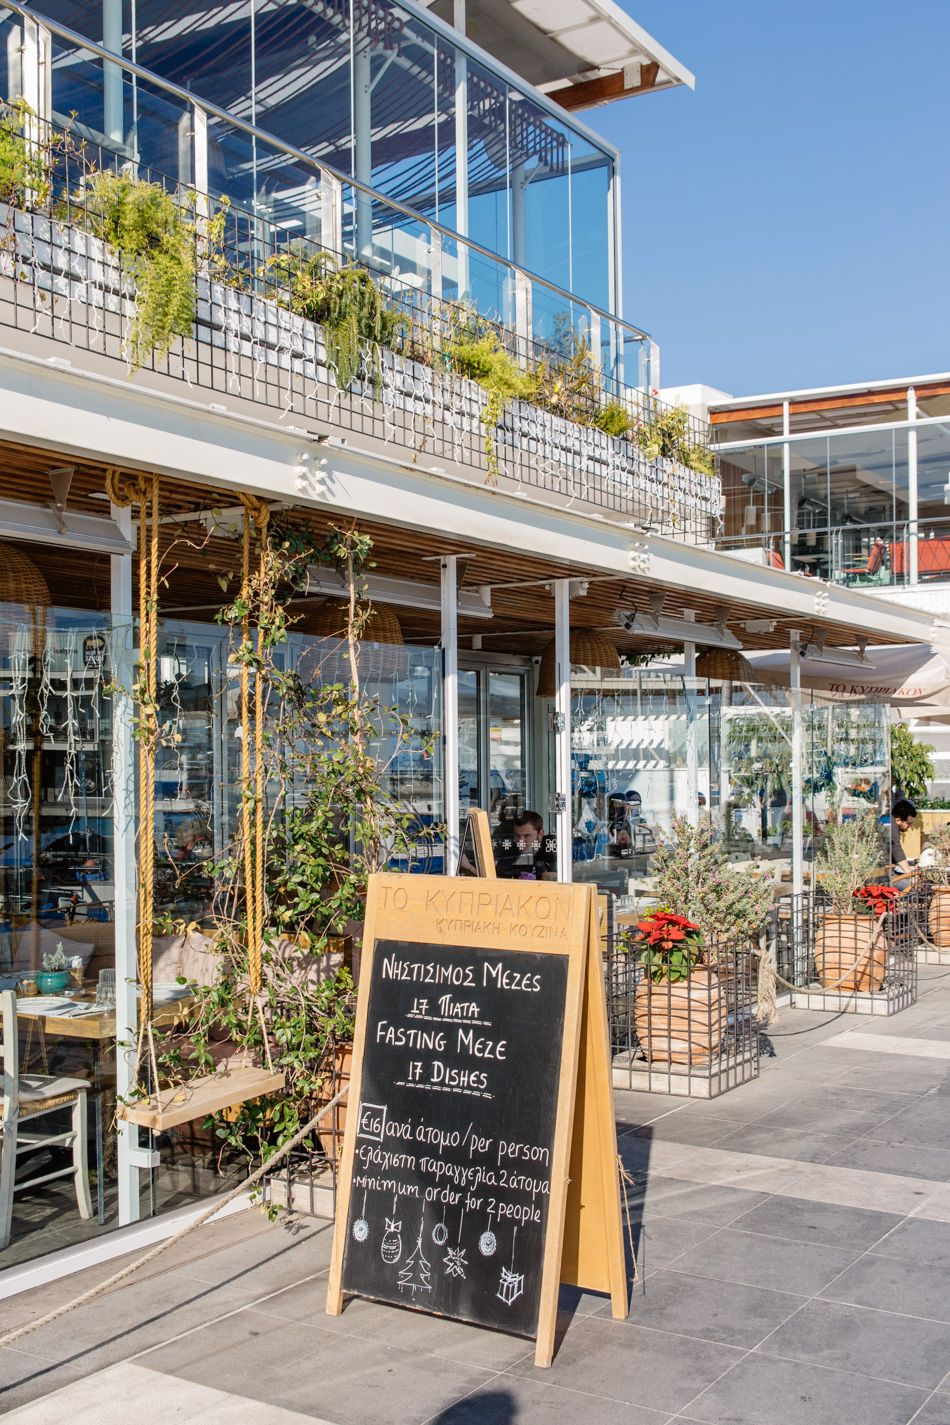 Lunch in Limassol Marina in 2020 Limassol, Enjoy the